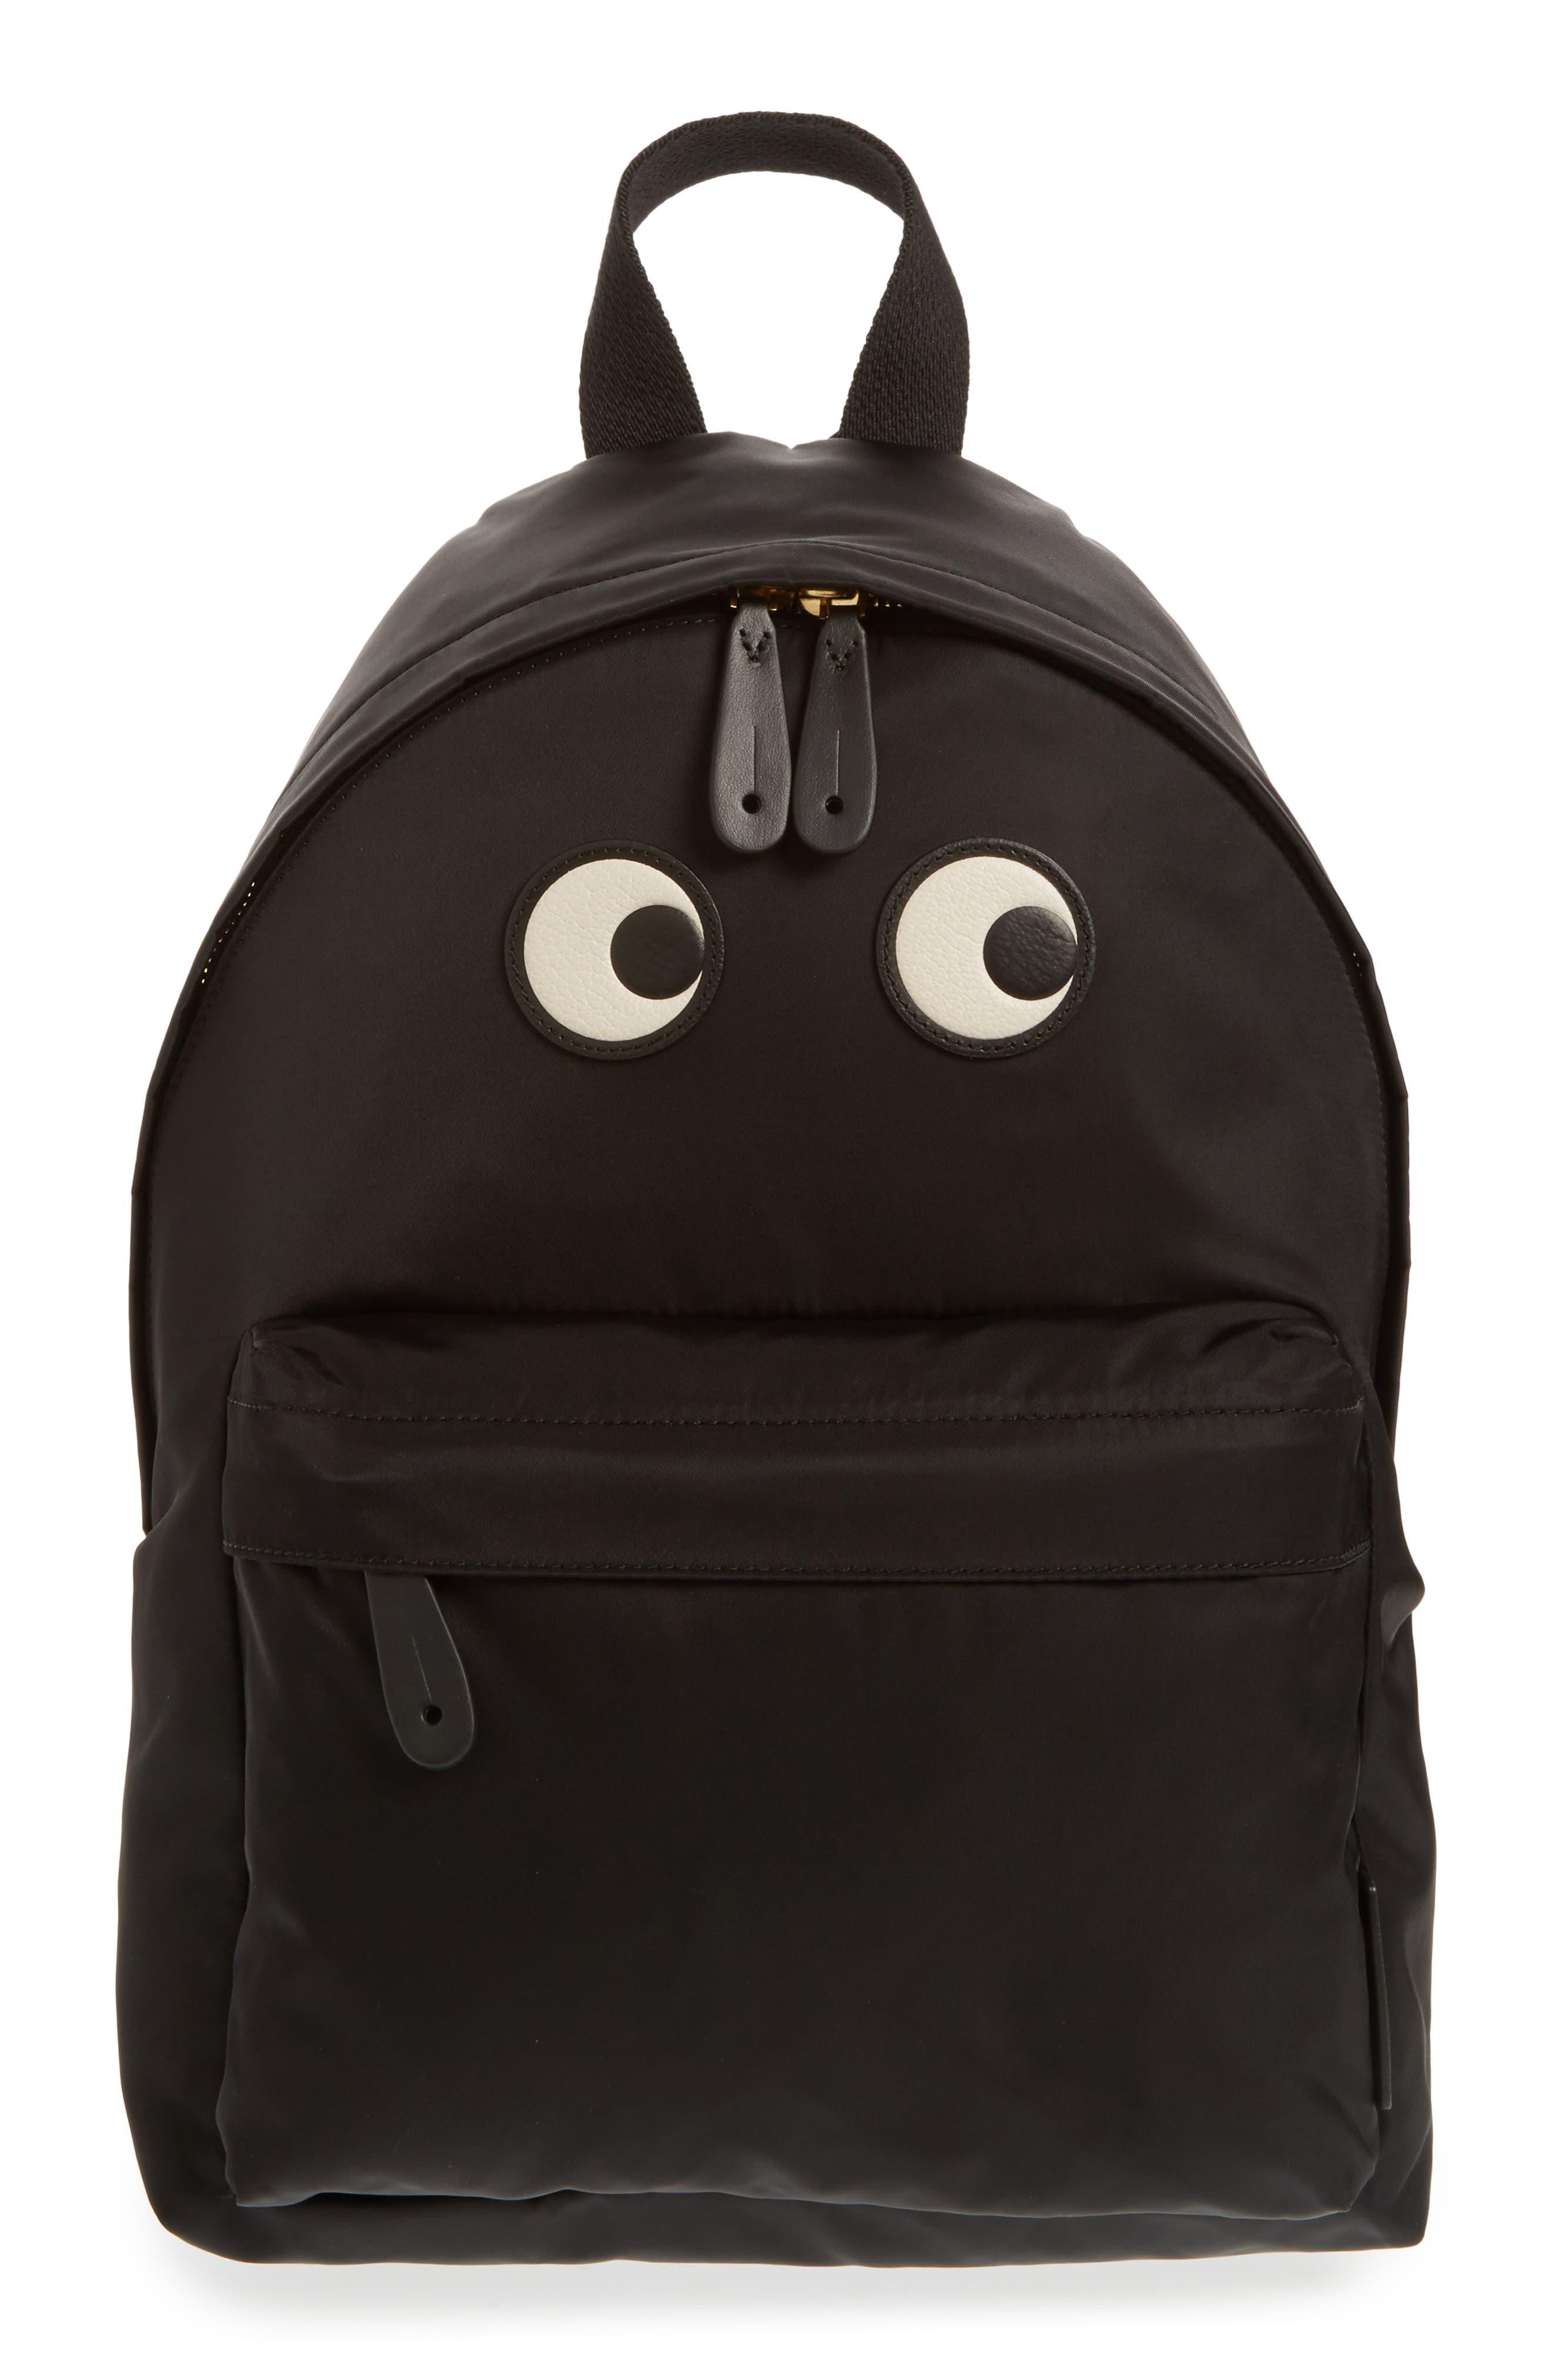 Anya Hindmarch Eyes Nylon Backpack